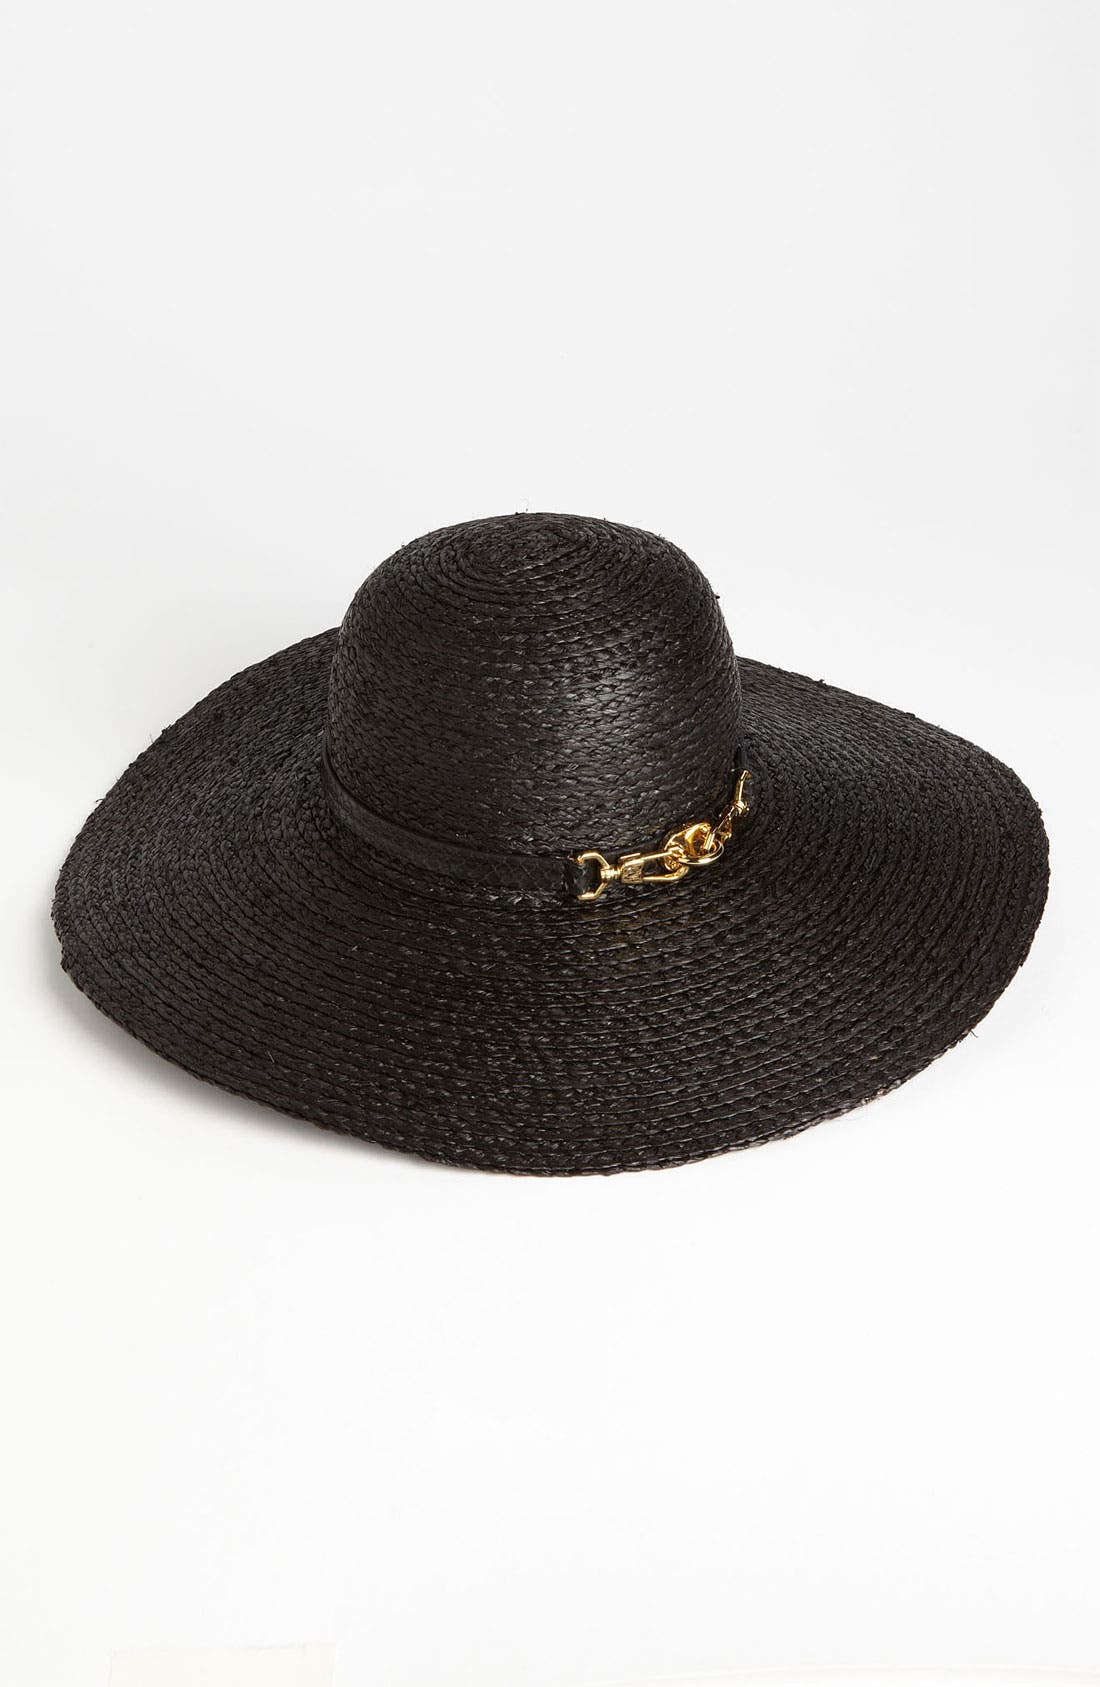 Alternate Image 1 Selected - Rachel Zoe Woven Sun Hat